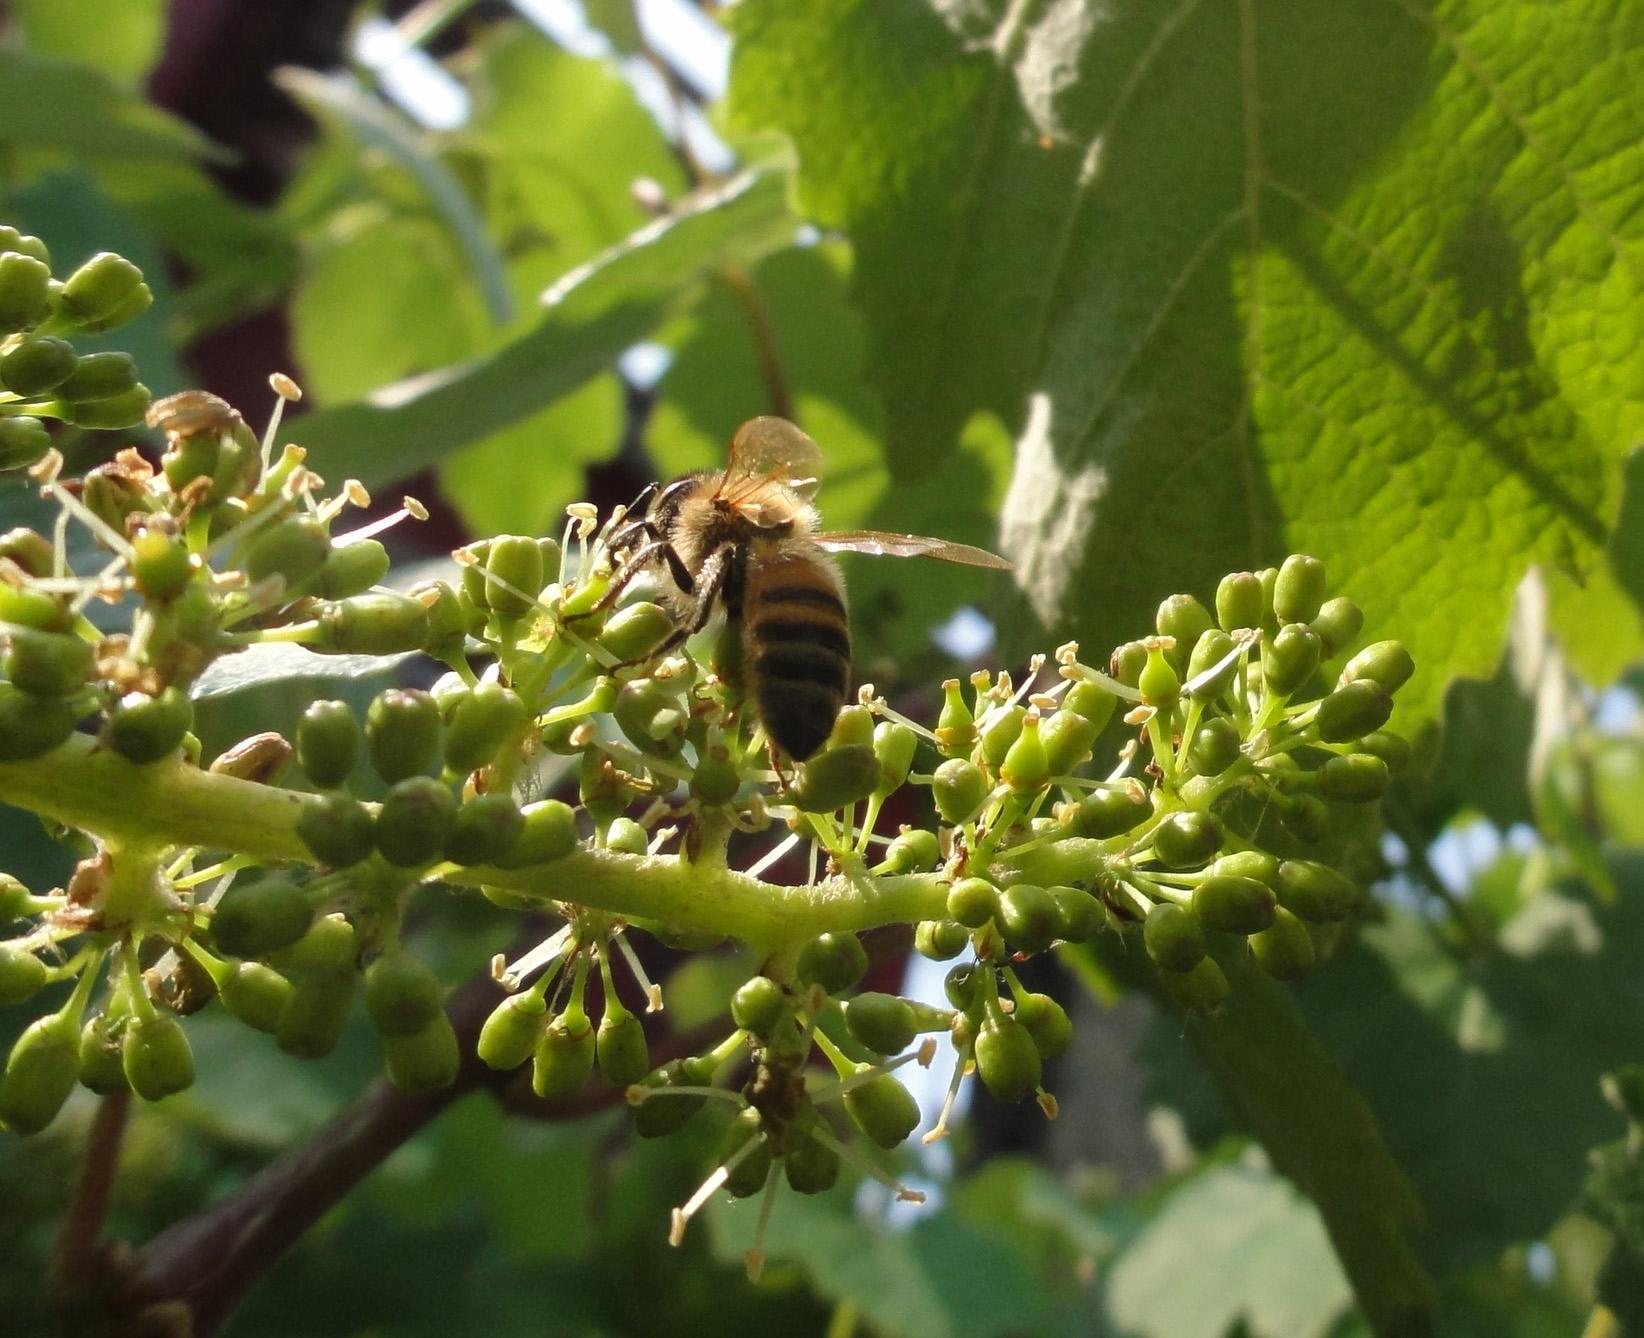 Bee on grape flower